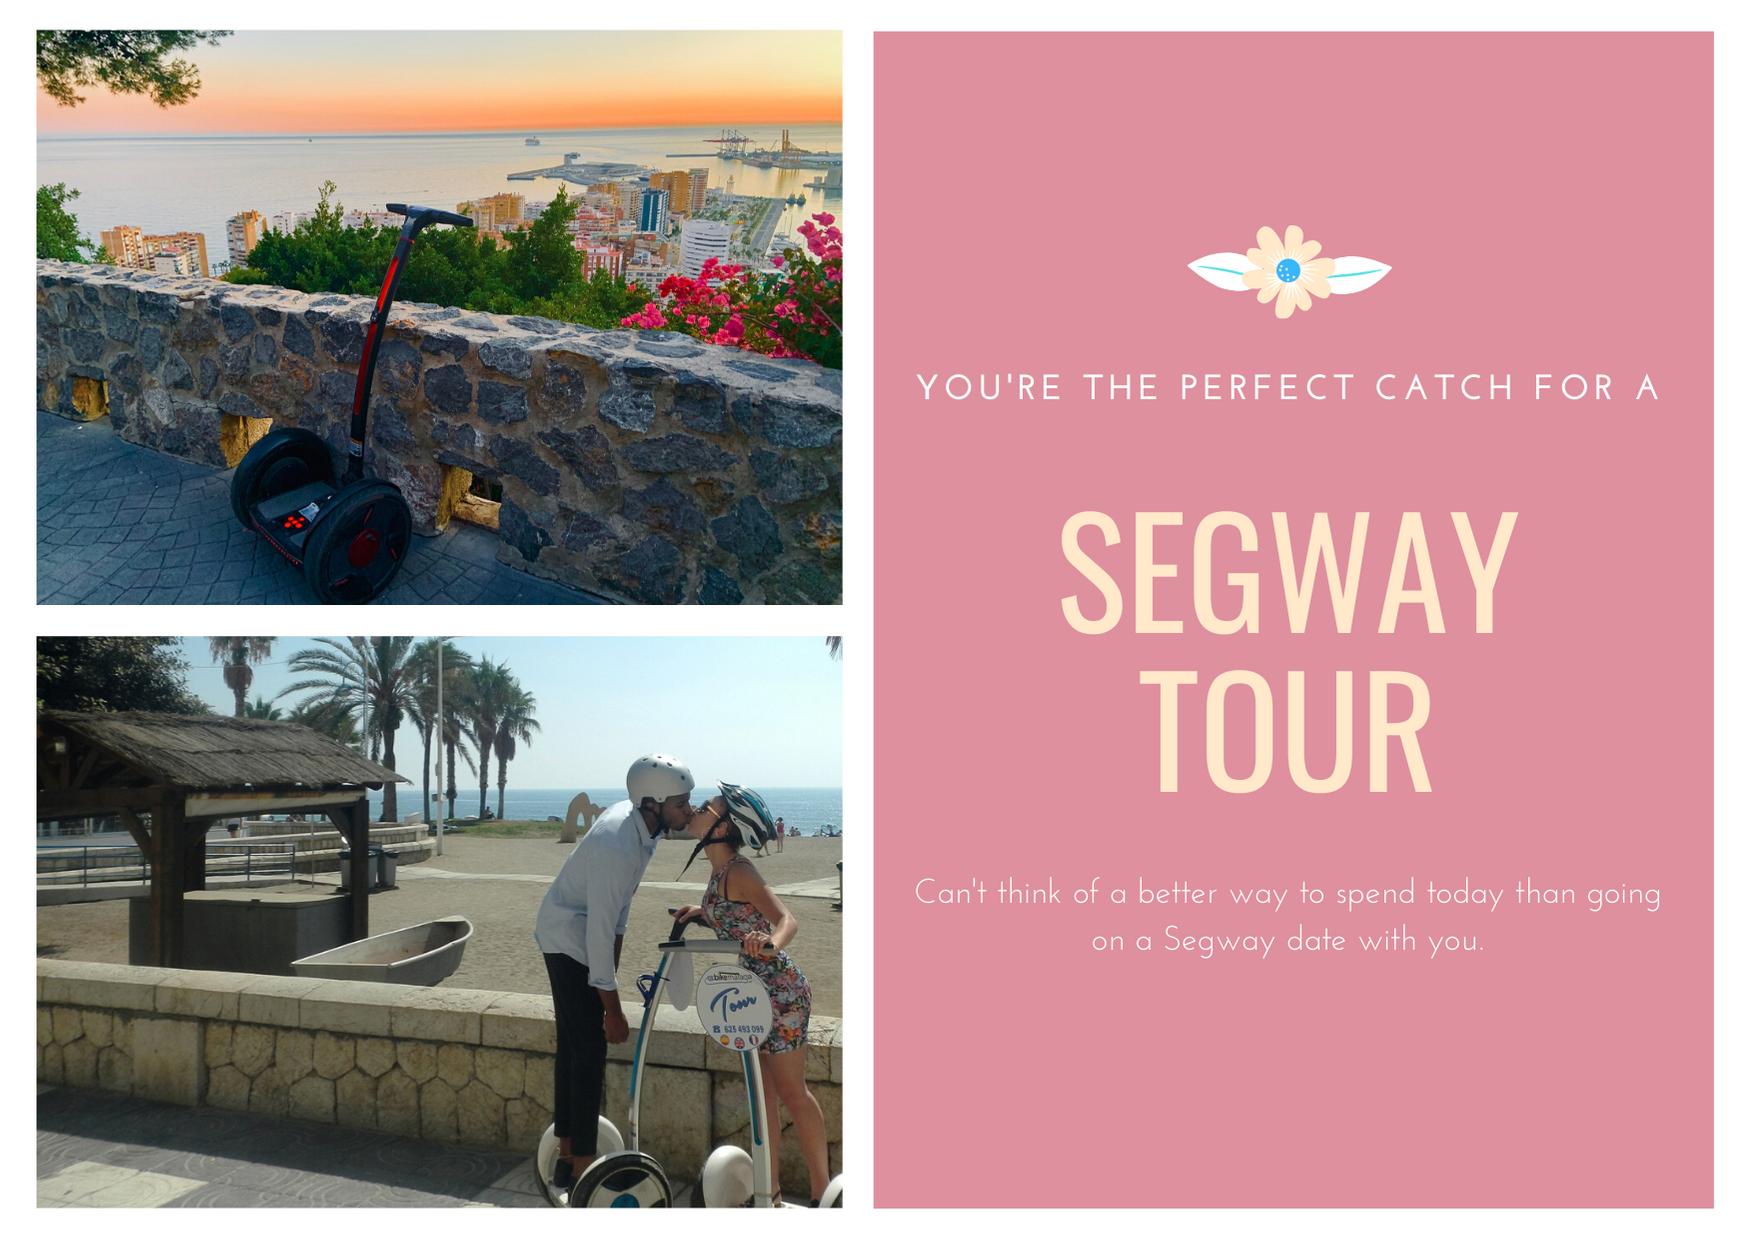 foto de tour with segway